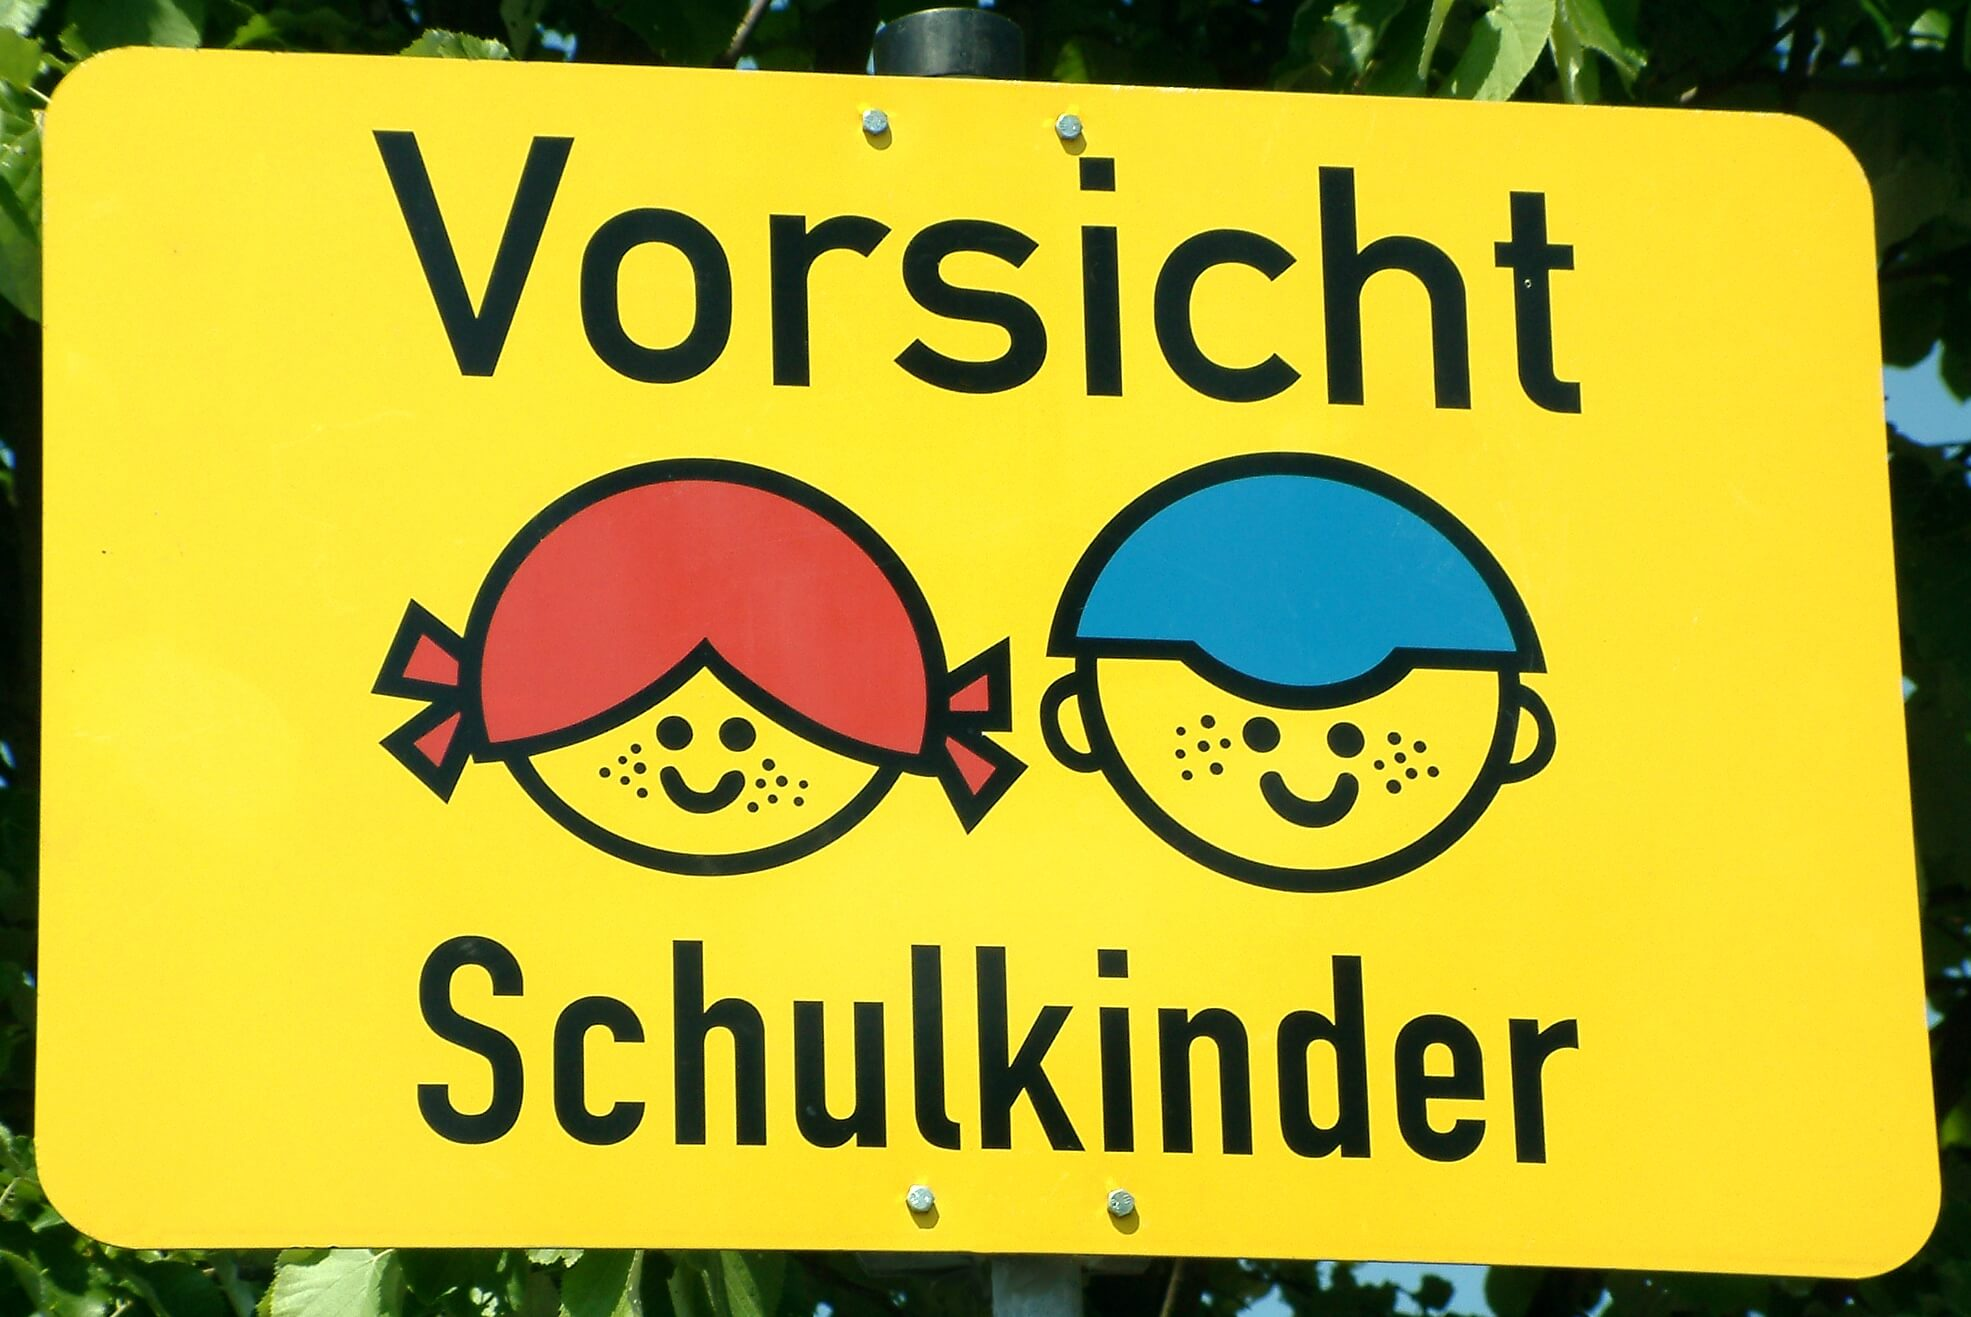 Schulkinder Verkehrsschild (c) Claudia Hautumm / pixelio.de